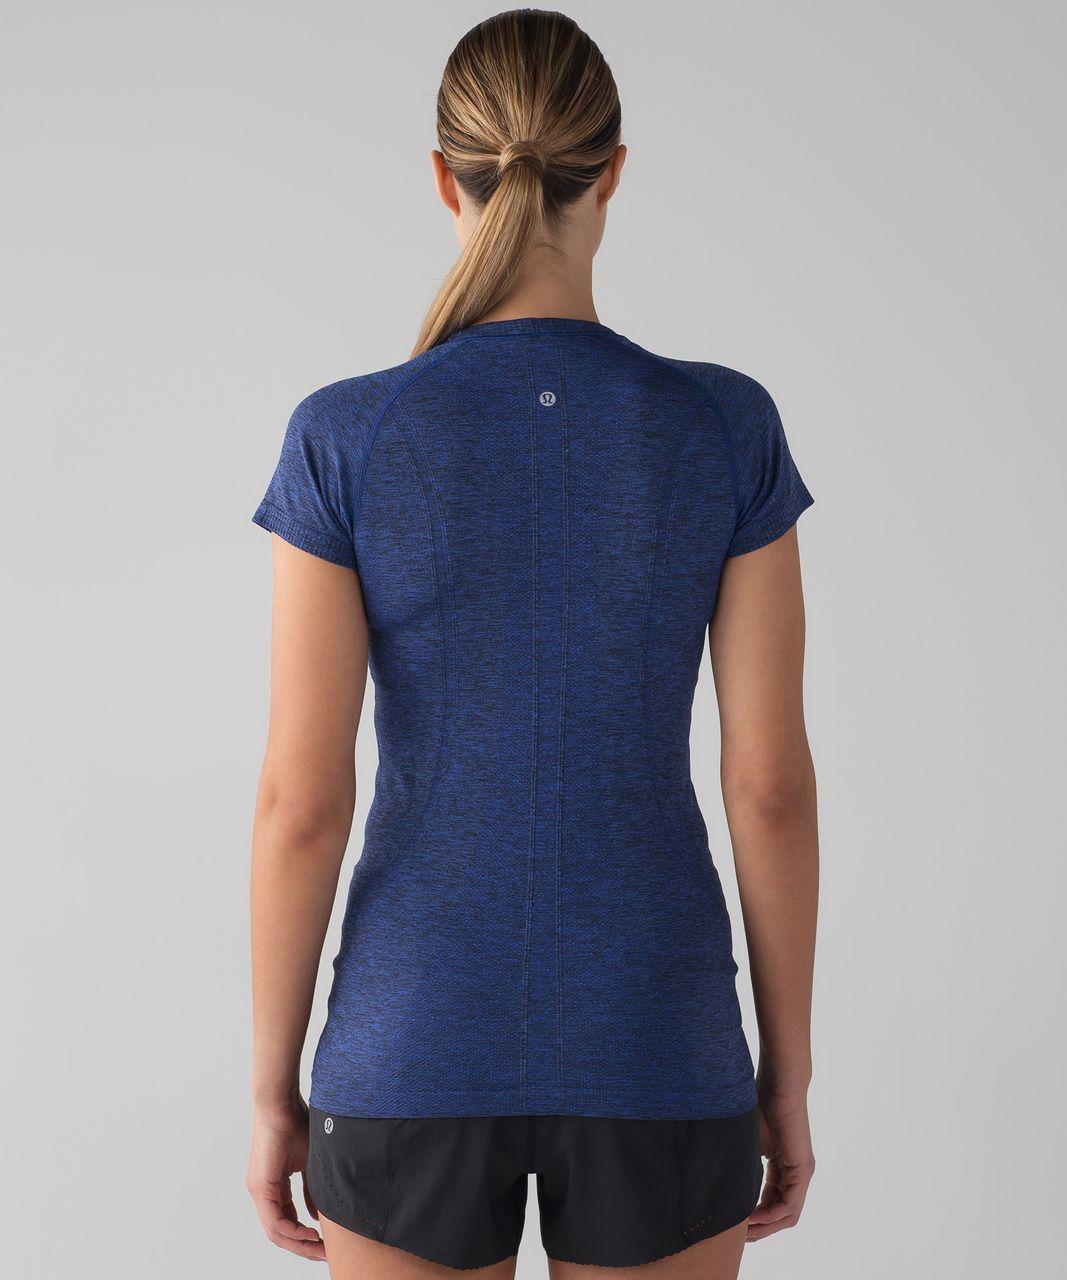 Lululemon Swiftly Tech Short Sleeve Crew - Blazer Blue / Black